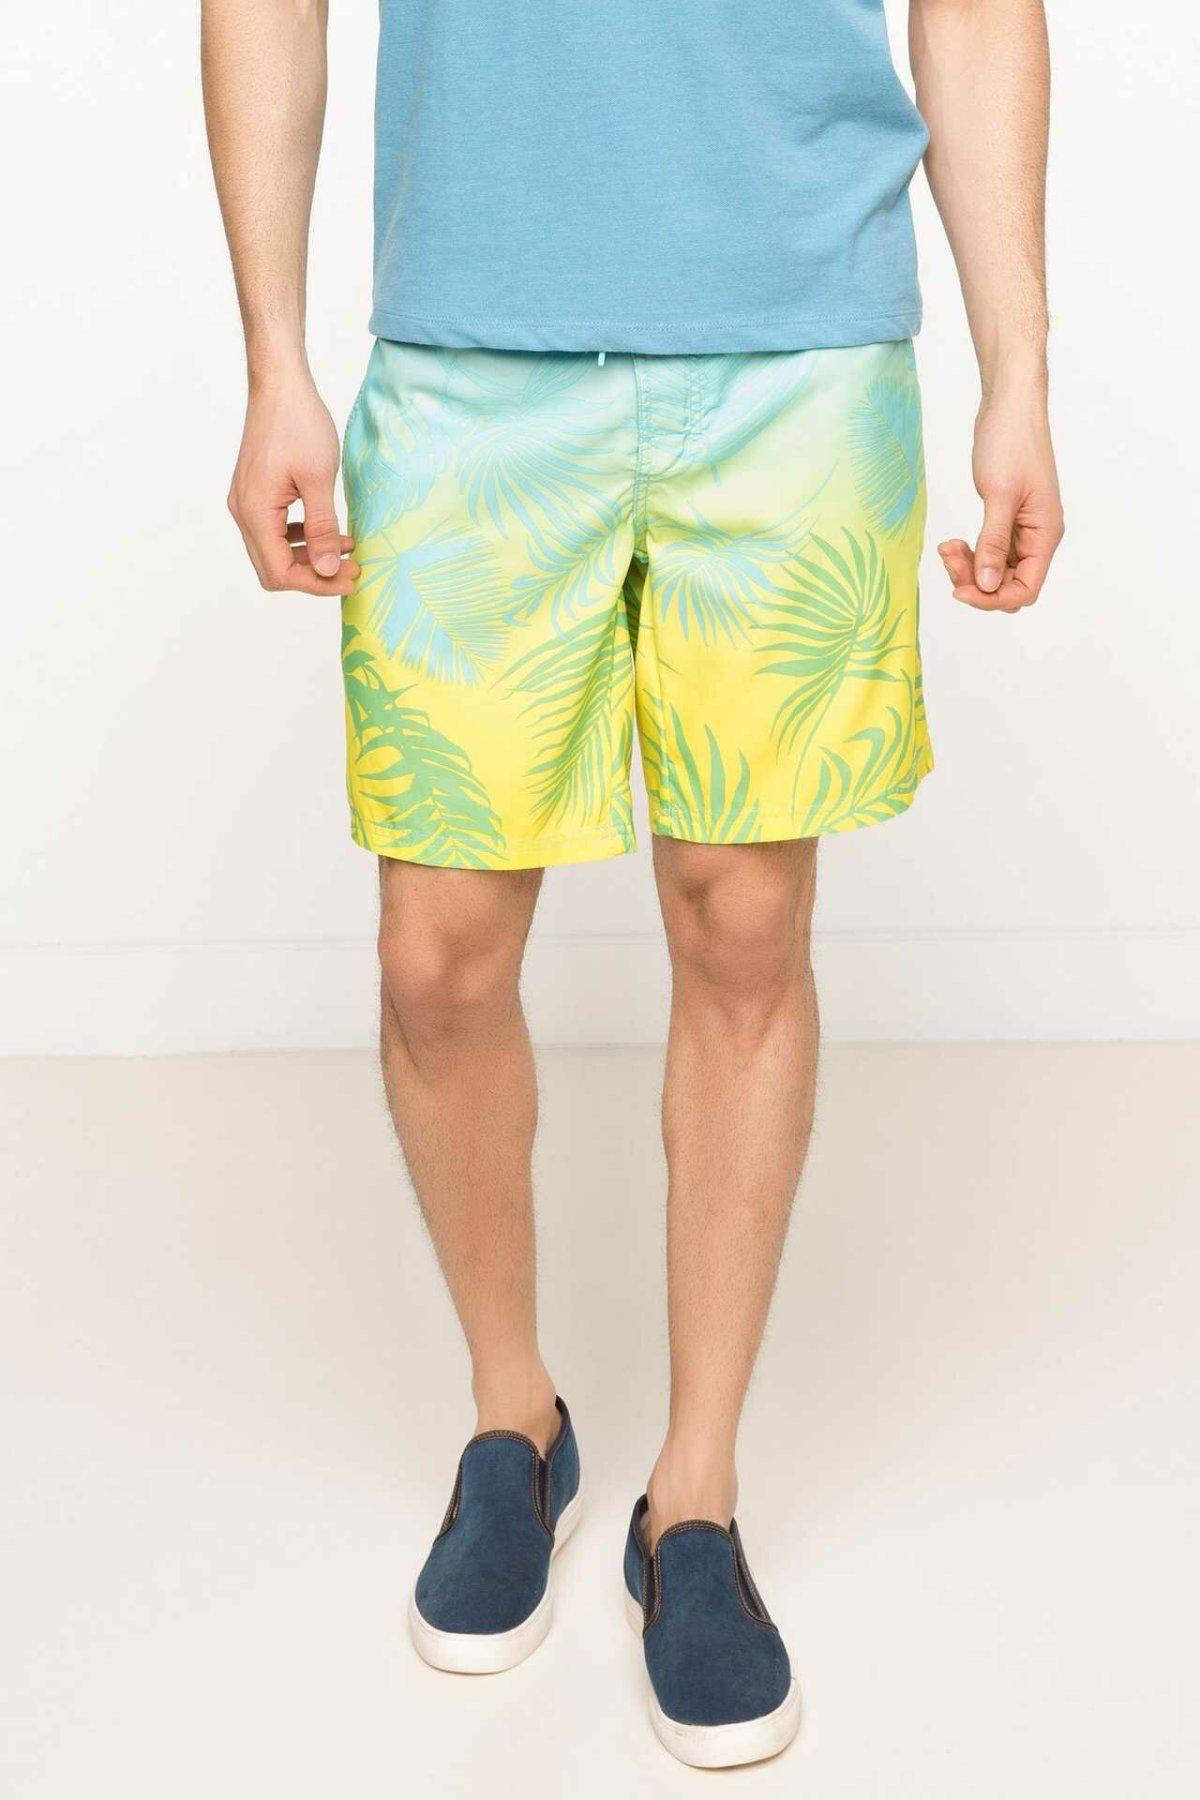 DeFacto Man Fashion Swimming Short Male Casual Beach Print Pattern Shorts Beach Swim Short Pants Summer - G7326AZ17HS